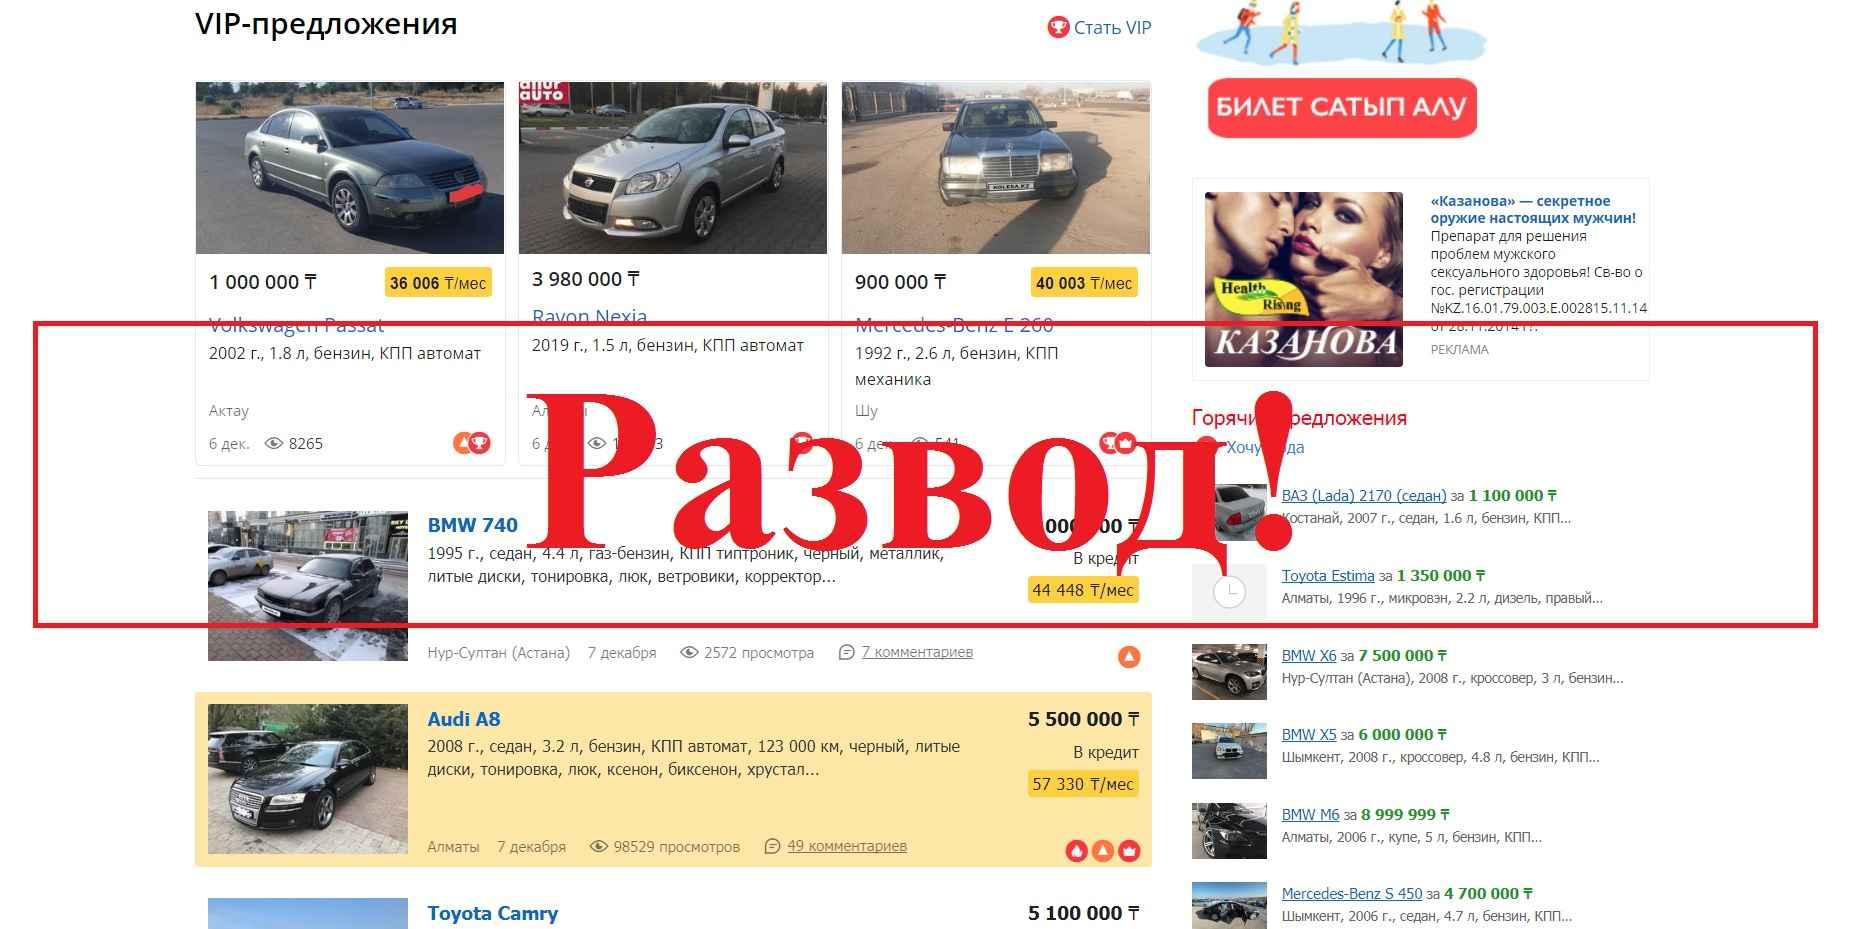 Kolesa.kz – как мошенники обманывают на сайте kolesa.kz